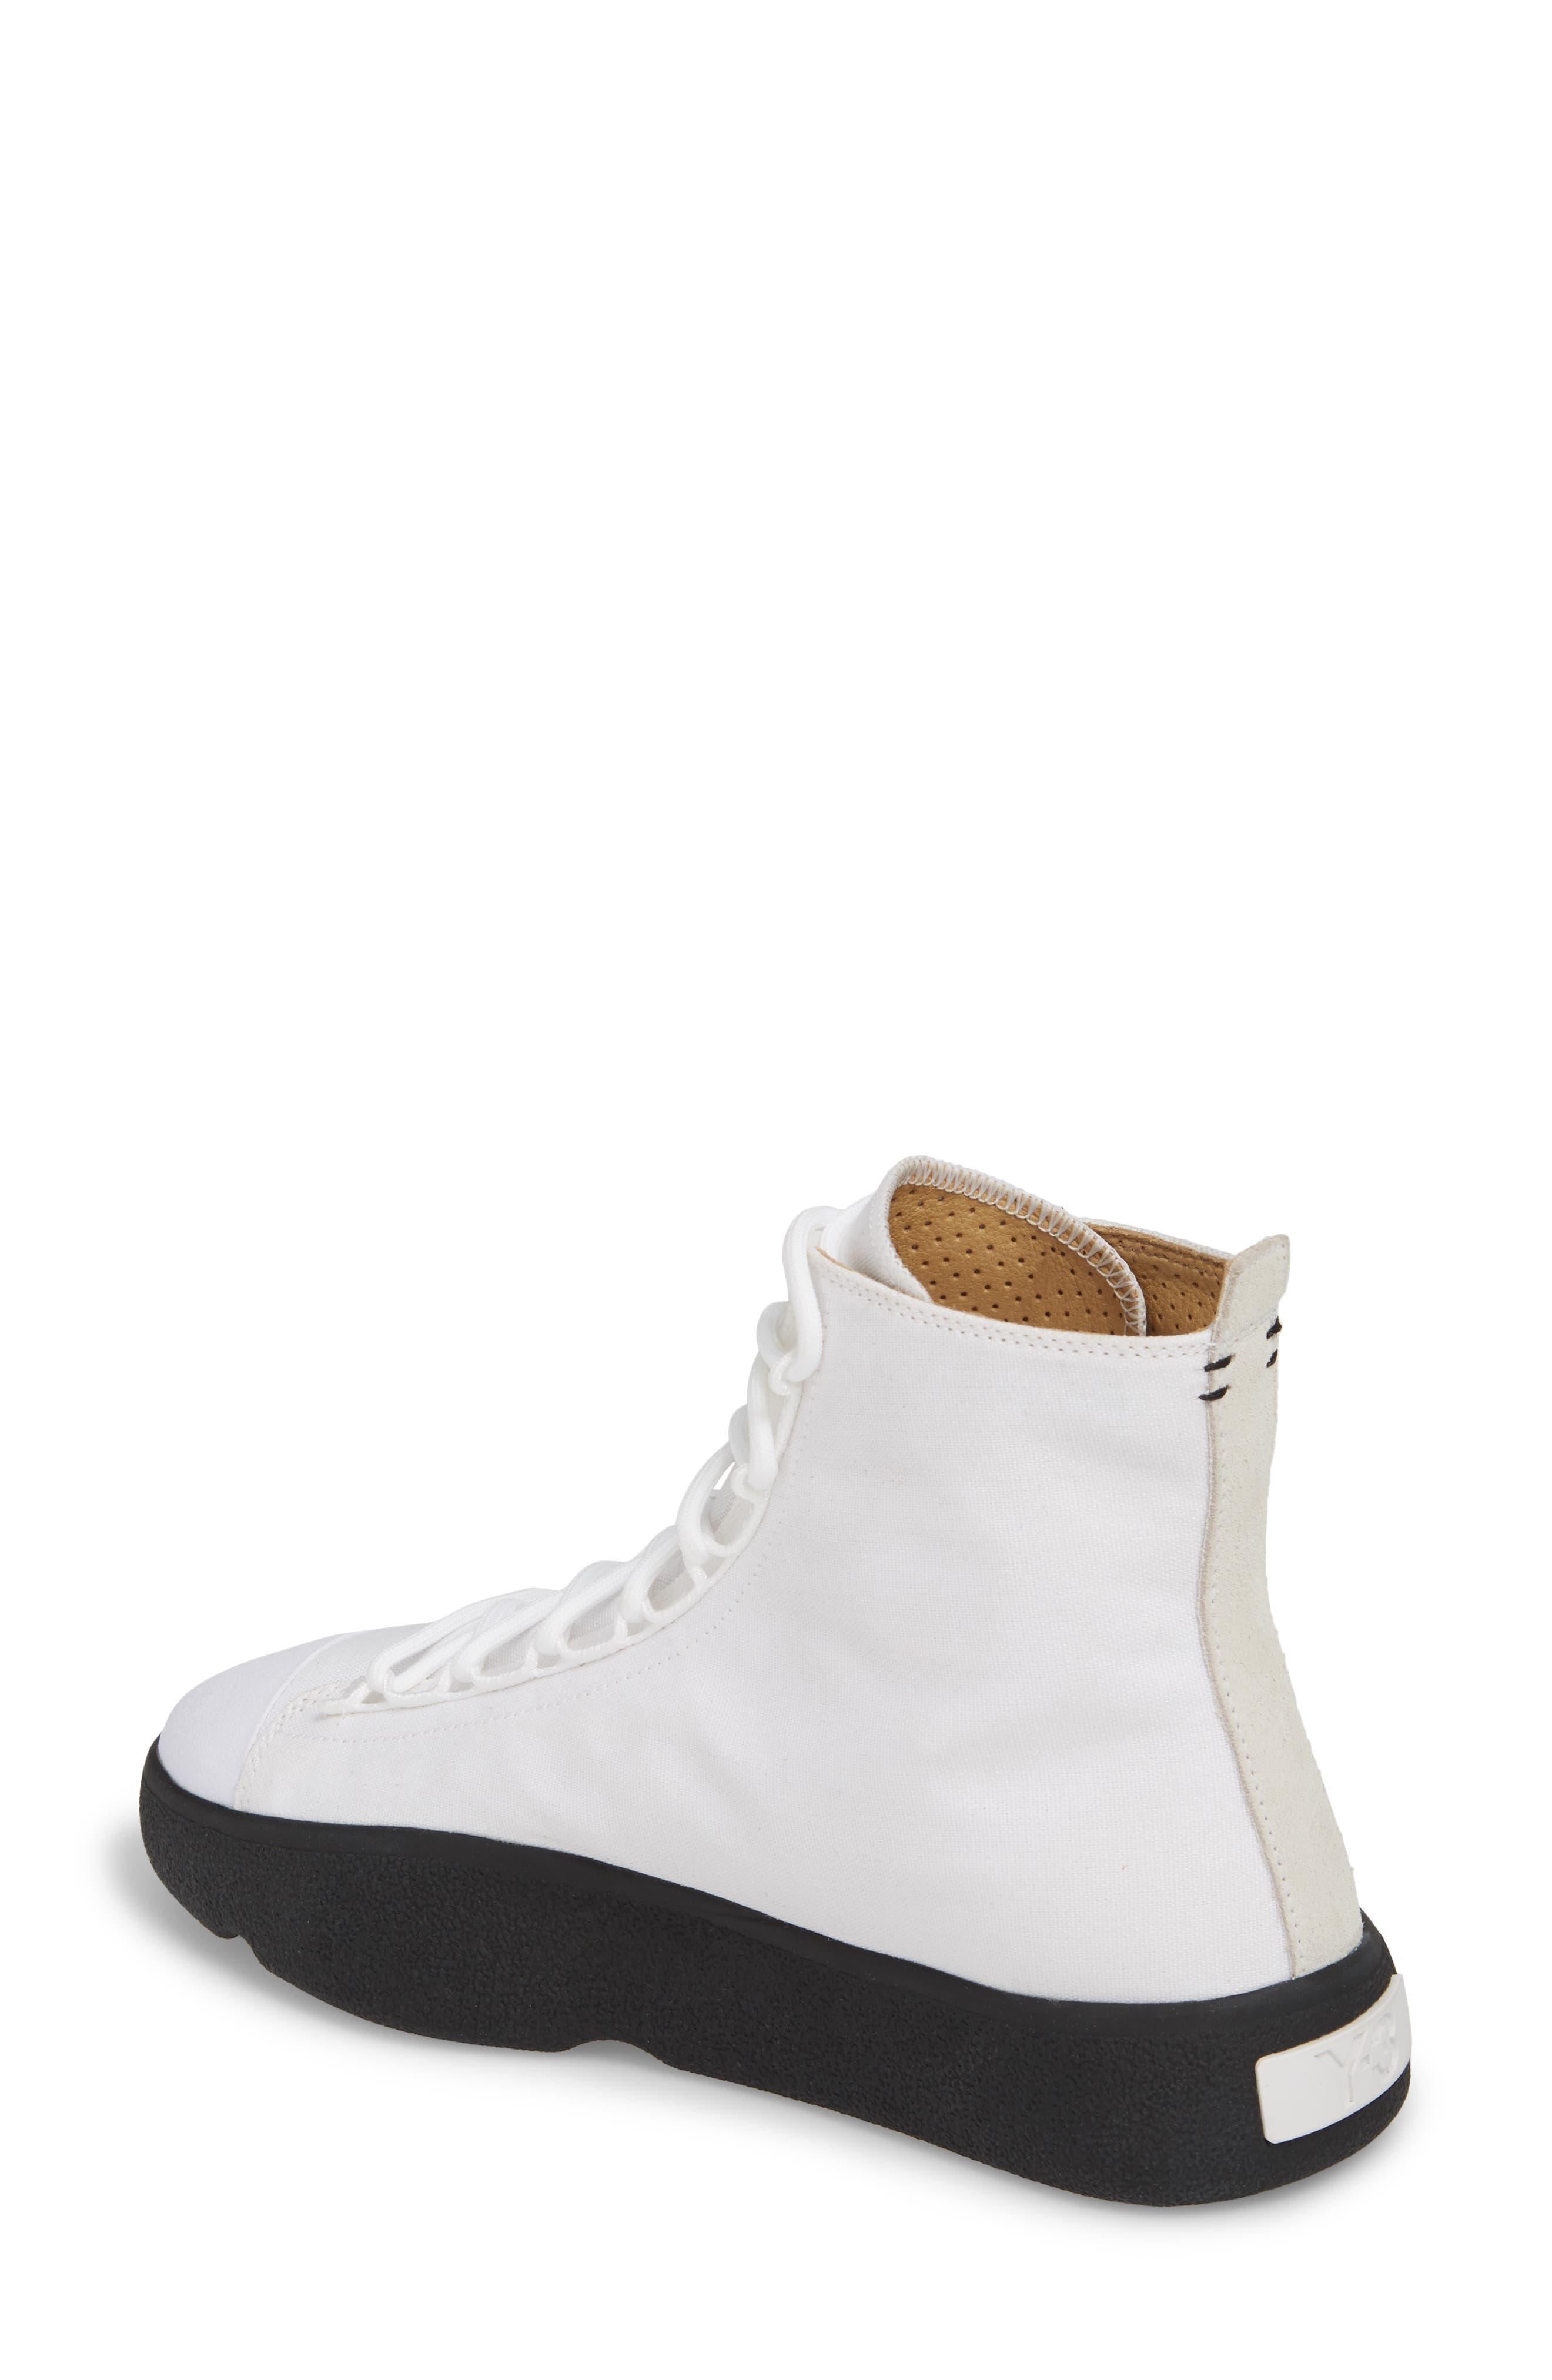 Bashyo High Top Sneaker,                             Alternate thumbnail 2, color,                             White/ Black